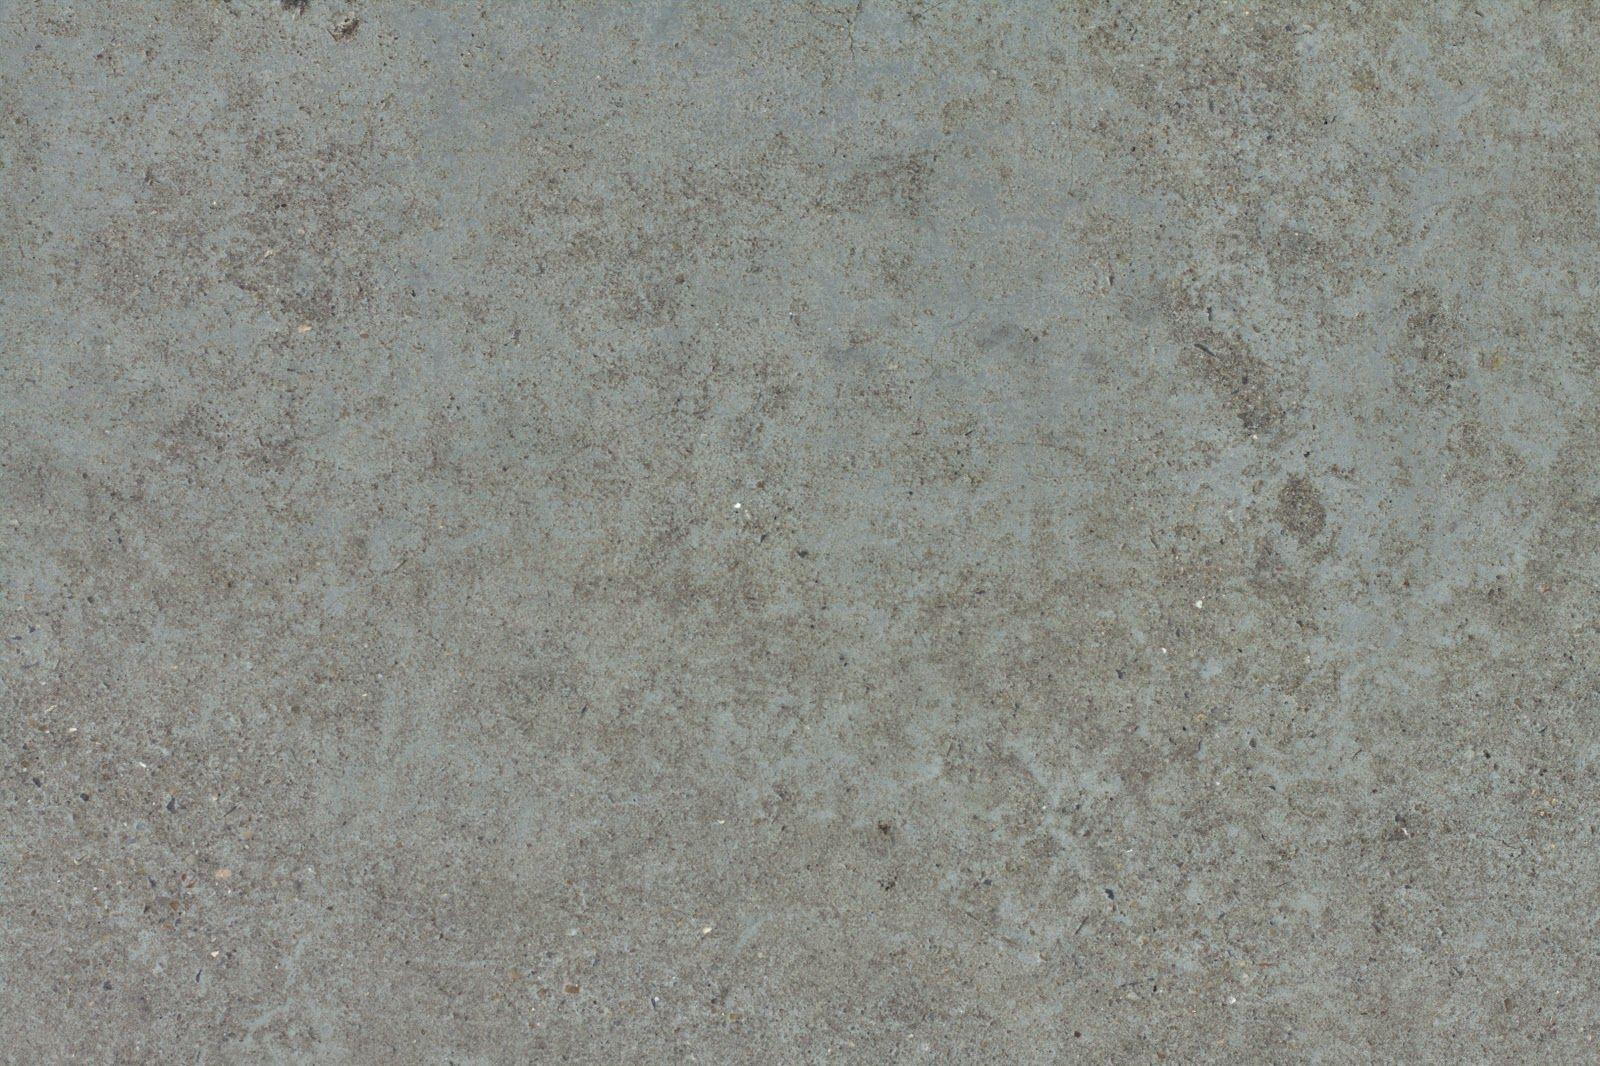 Smooth Sandstone Texture Seamless Google Search Sandstone Texture Texture Limestone Texture